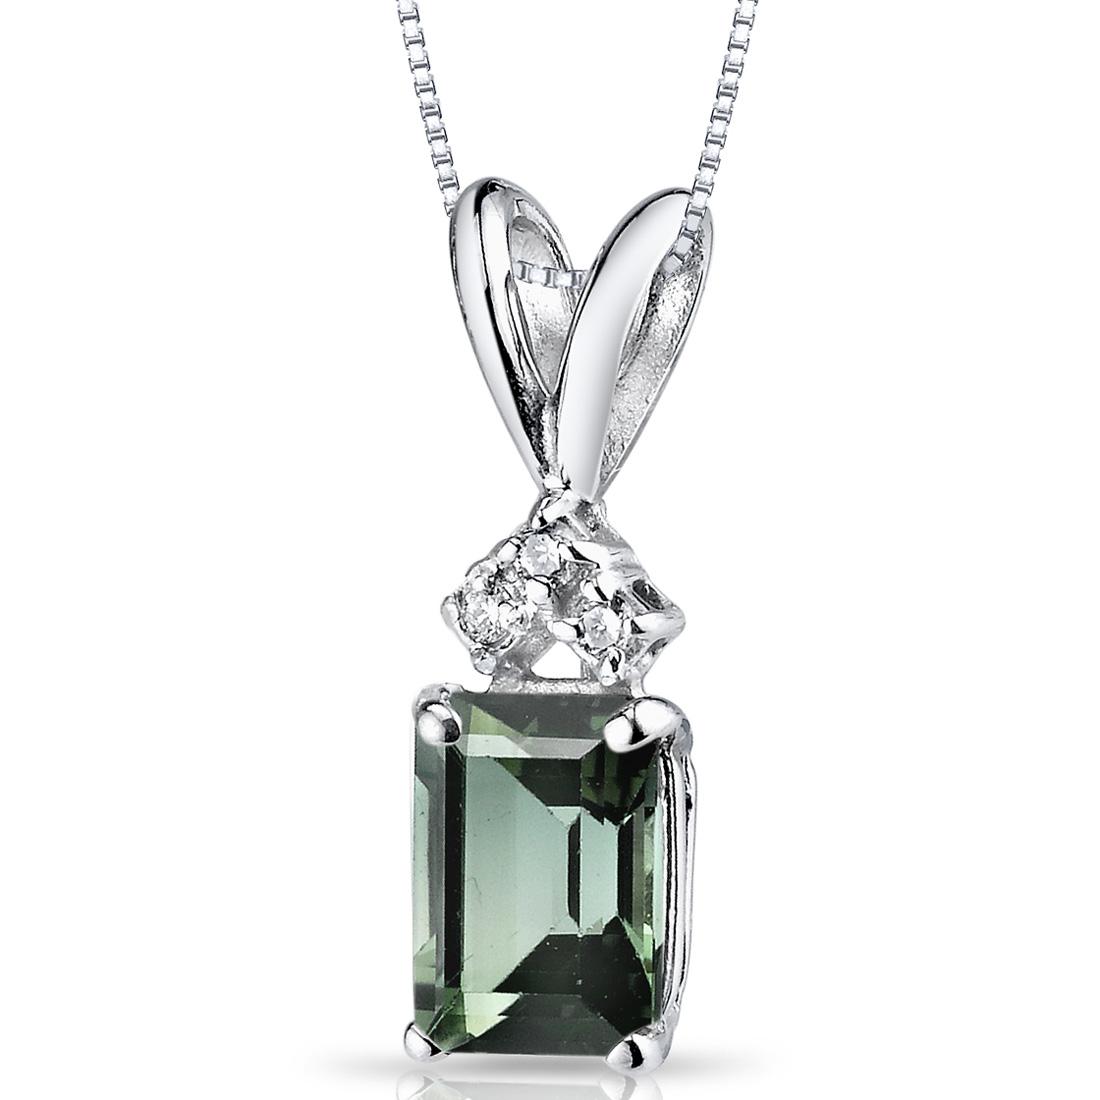 peora 14 Karat White Gold Emerald Cut 1 Carats Green Tourmaline Diamond Pendant Necklace at Sears.com